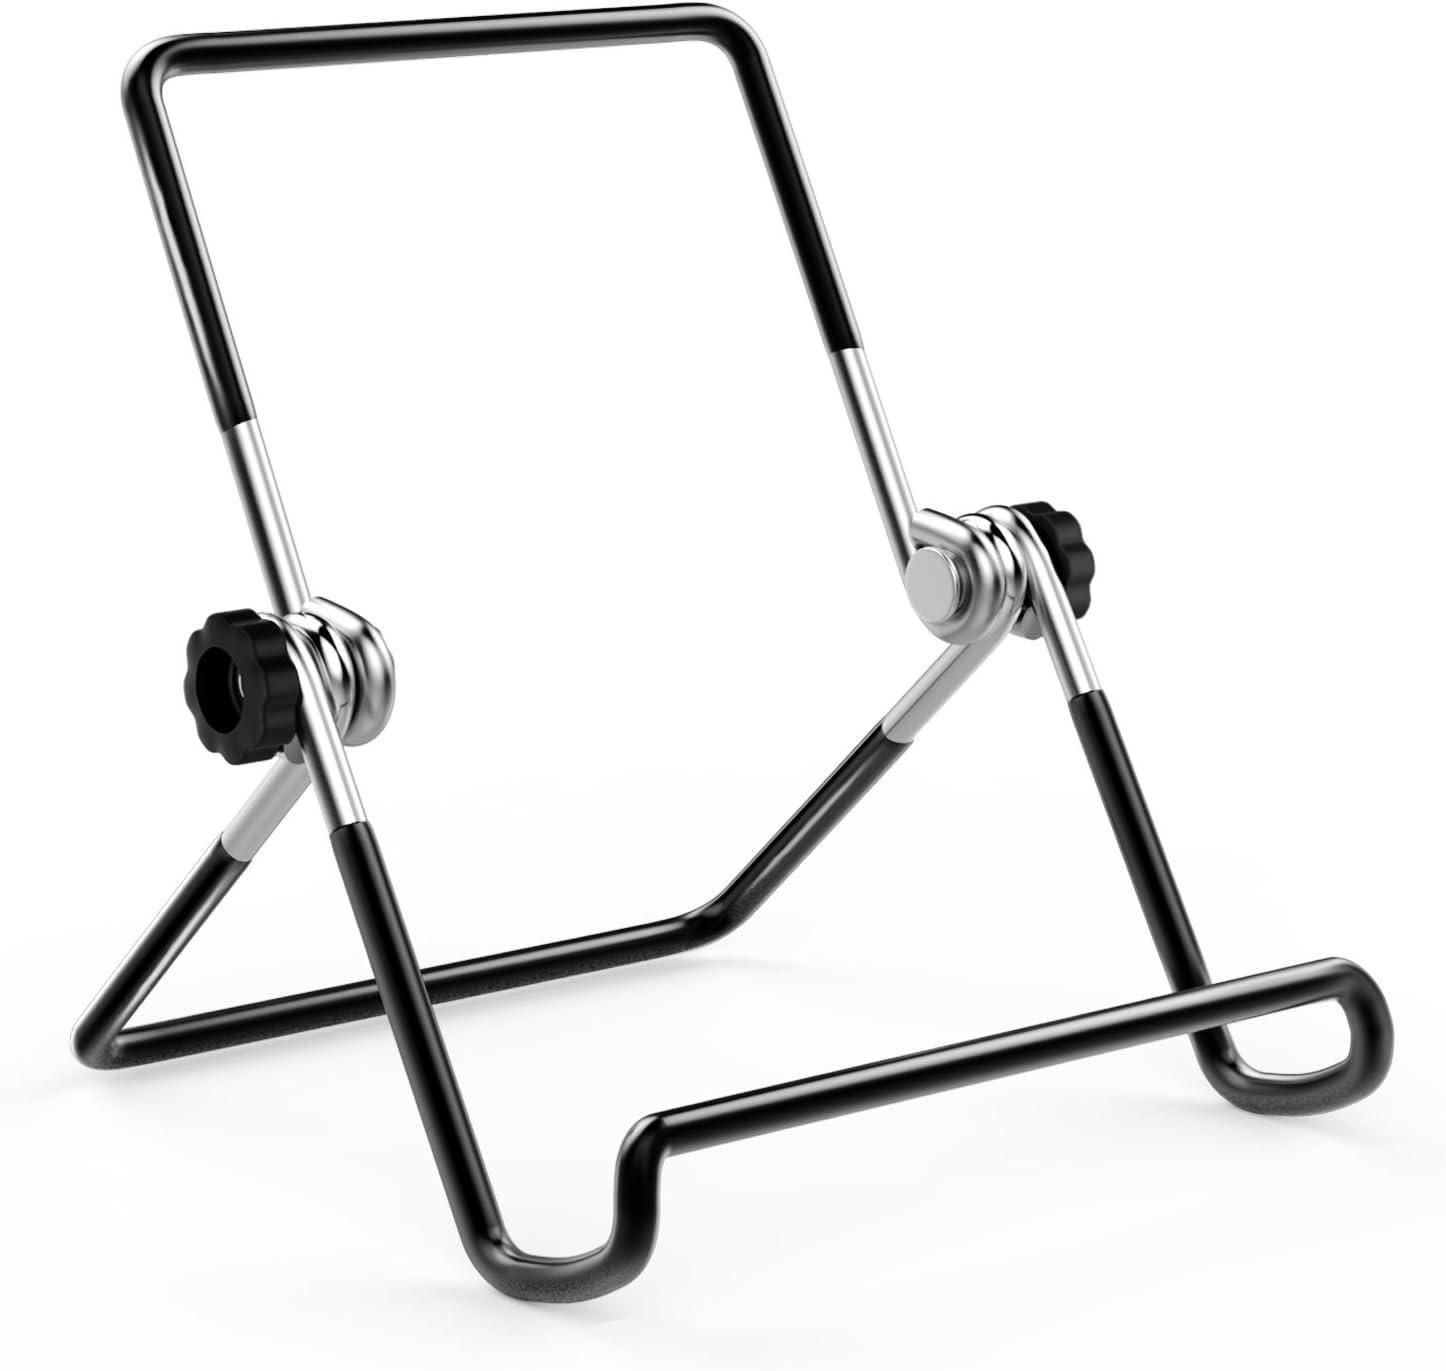 "MoKo Foldable Tablet Stand, Adjustable Portable Metal Holder Cradle for 9-12.9"" Tablet Fit iPad 10.2"" 2019, New iPad Air 3, Mini 5, iPad Pro 11 2018 Samsung Tab E 9.6/Tab A 10.1, BLACK"